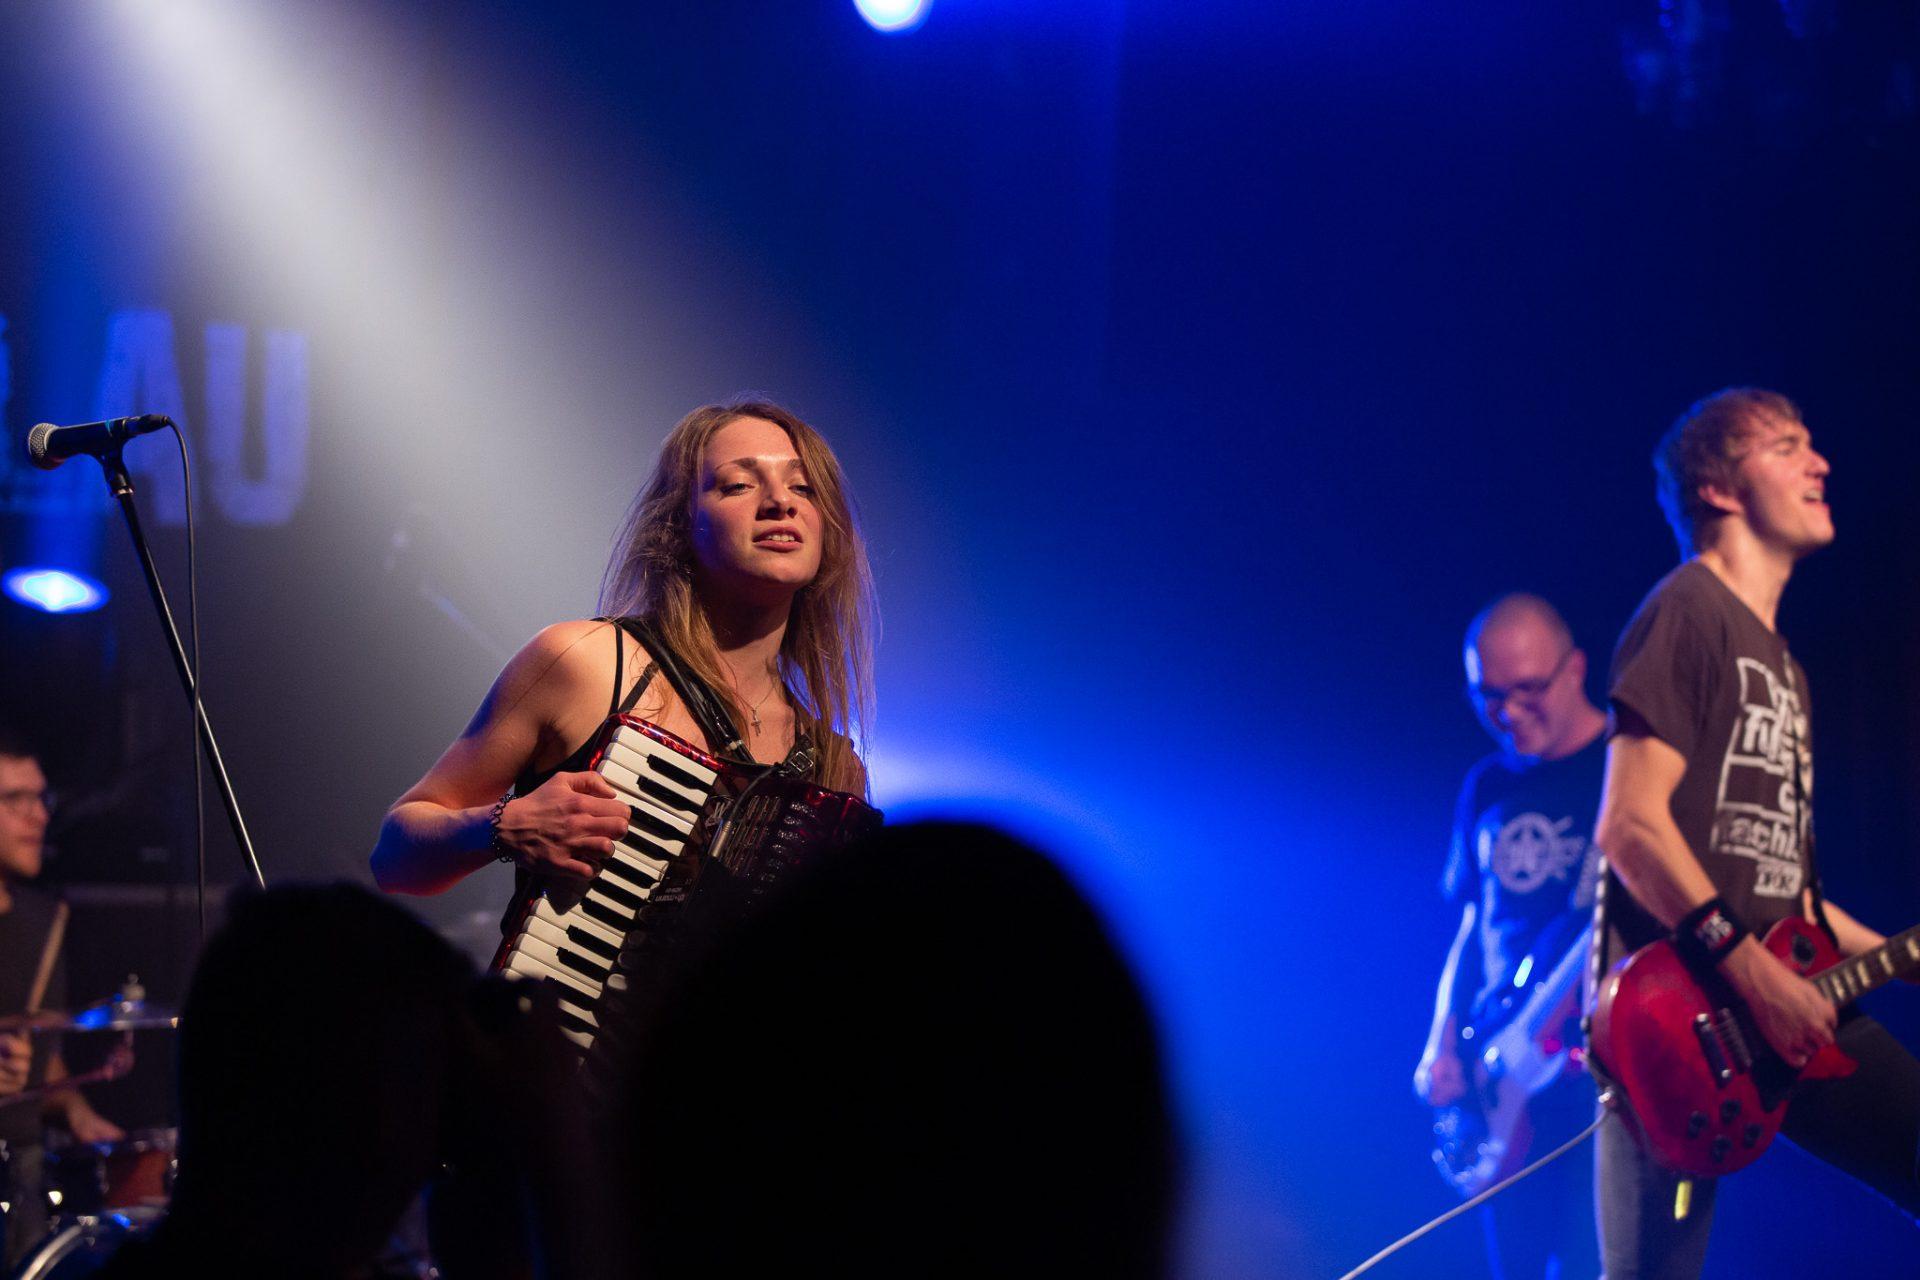 Kornblumenblau - Saengerin mit Akkordeon und Band